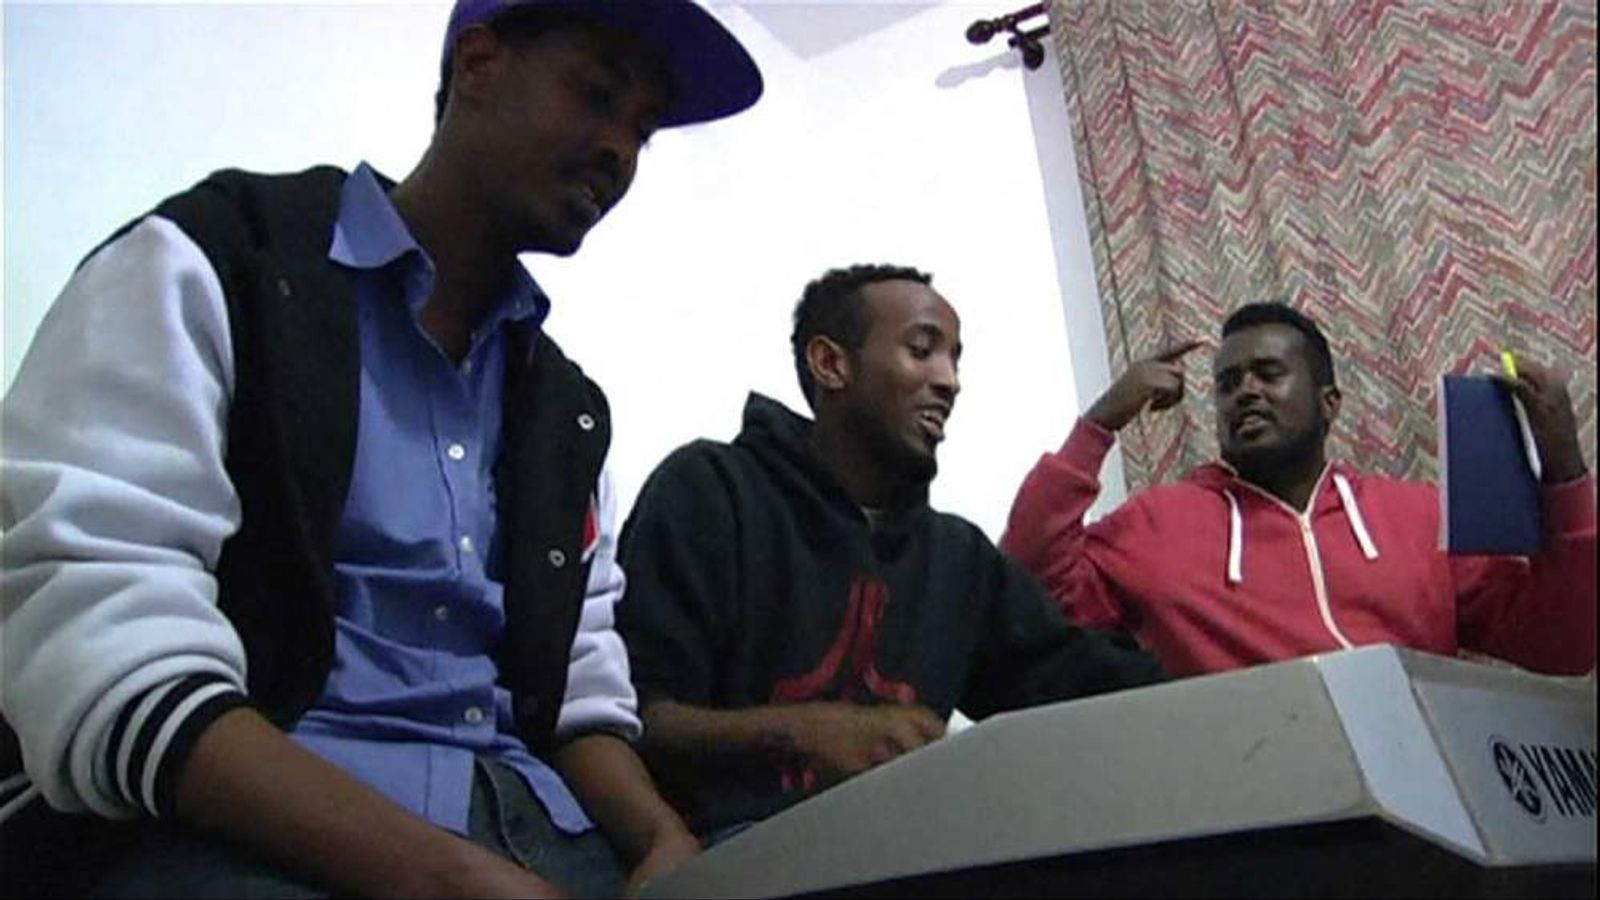 Somali musicians in Nairobi, Kenya